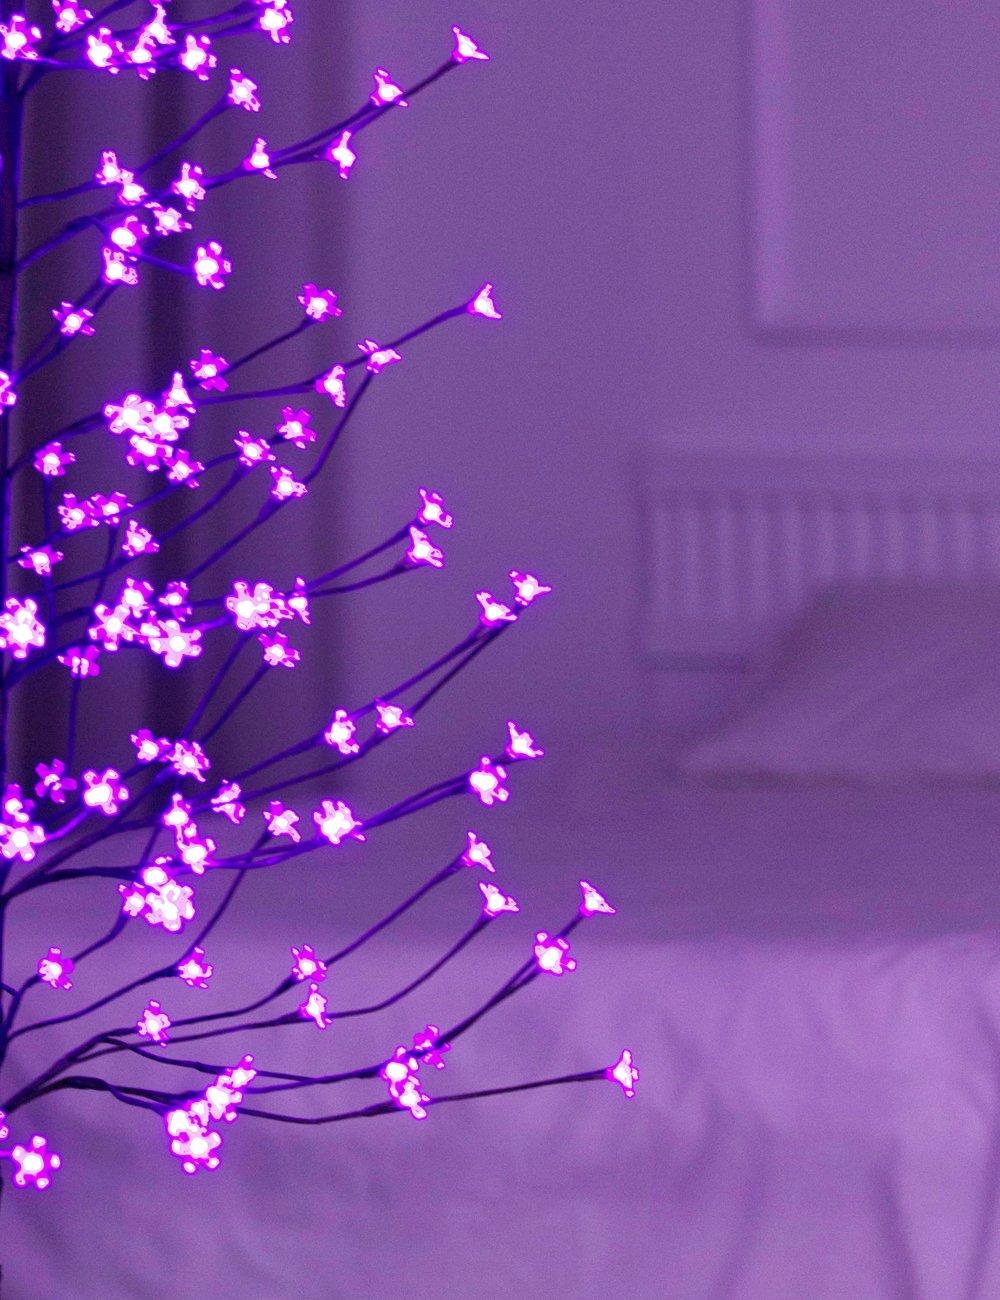 Bolylight LED Cherry Blossom Tree in Purple